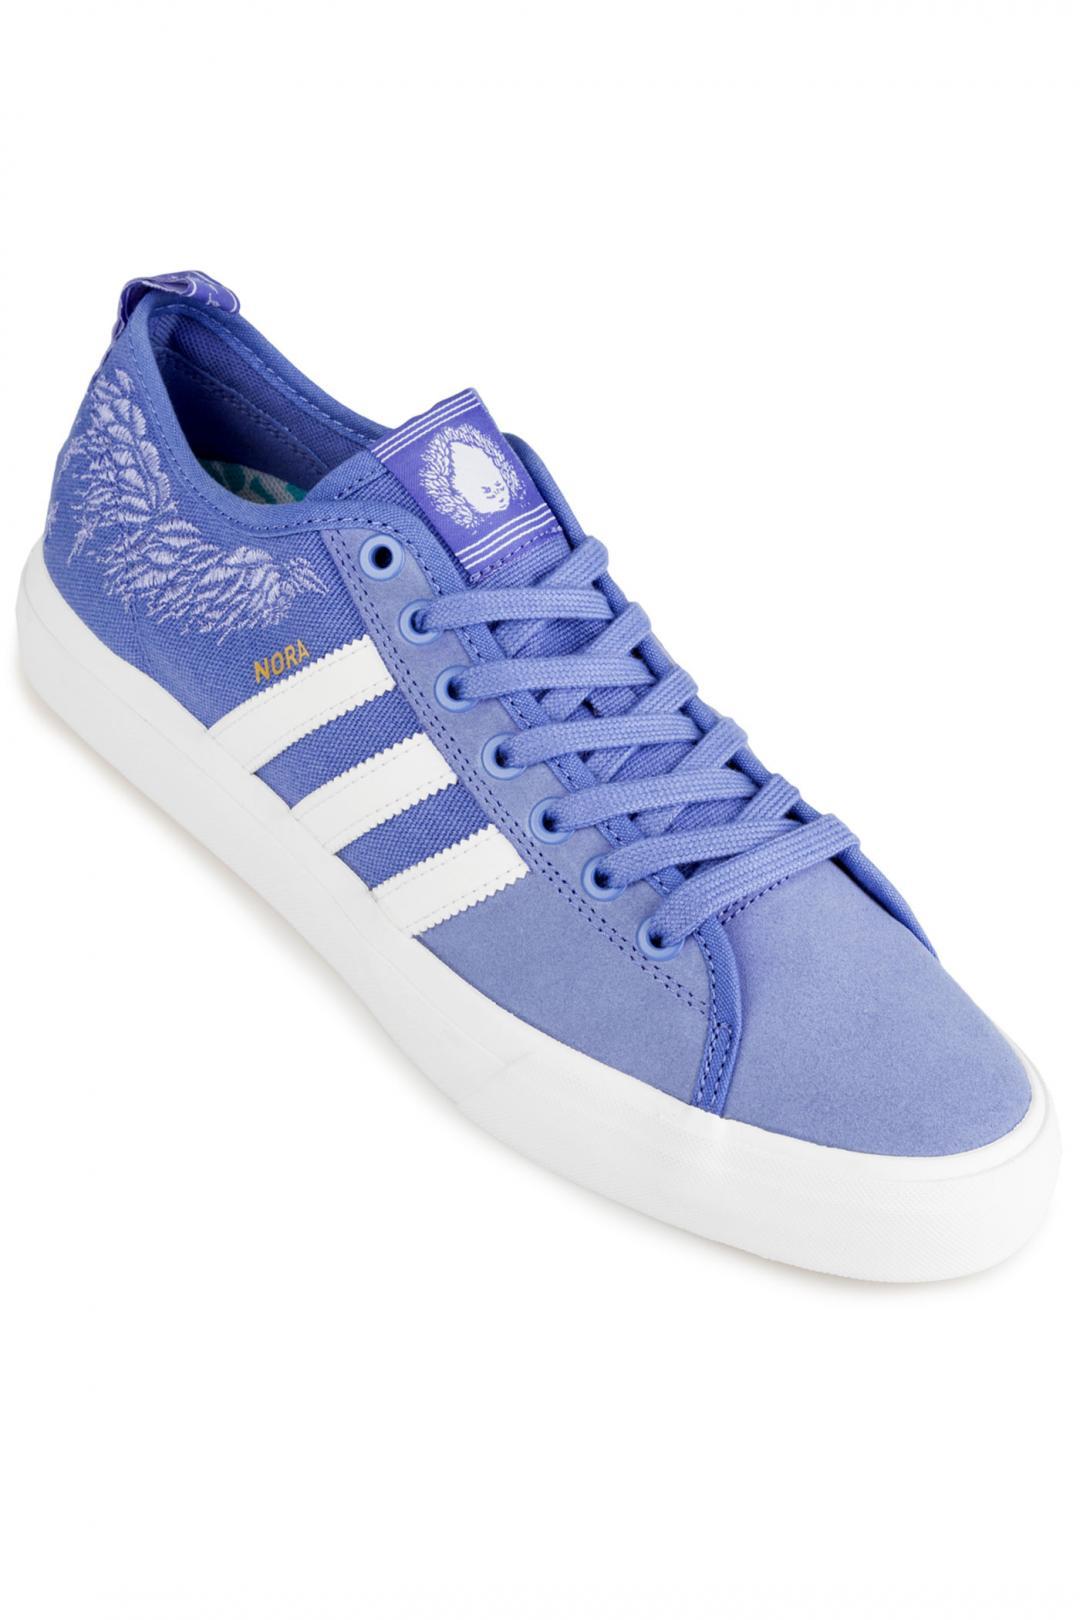 Uomo adidas Skateboarding Matchcourt RX Nora blue | Sneaker